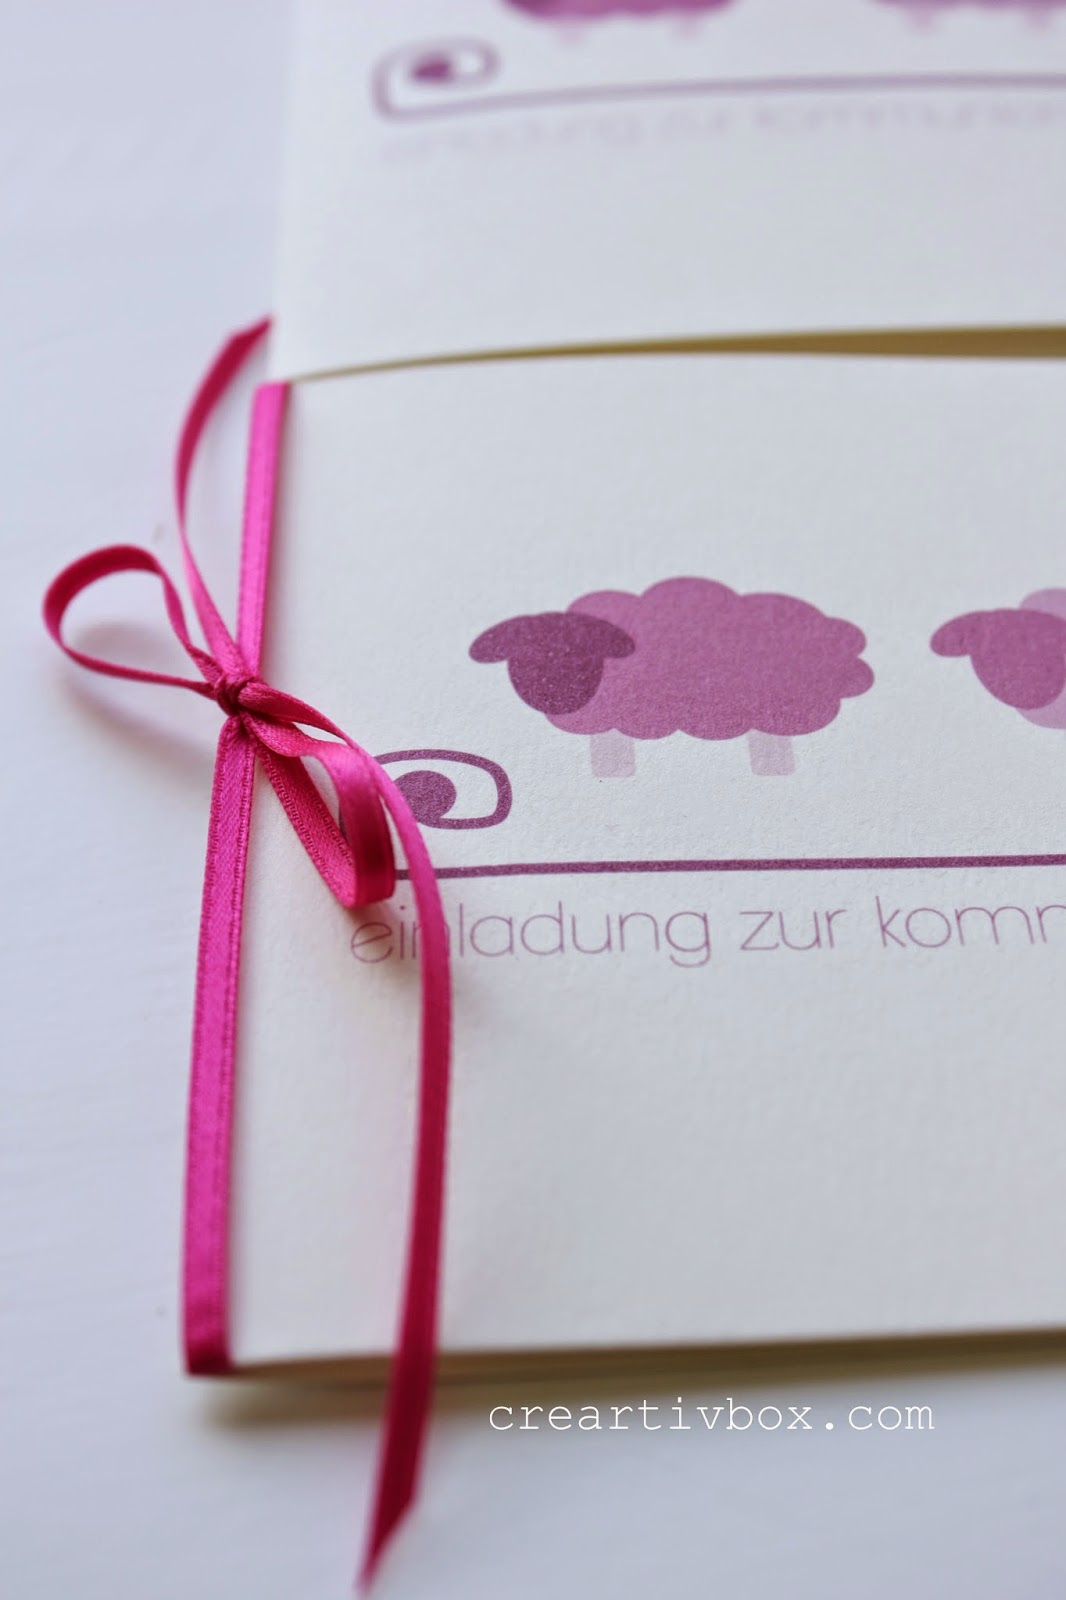 creartiv.box: Rosa Wölkchen-Schafe